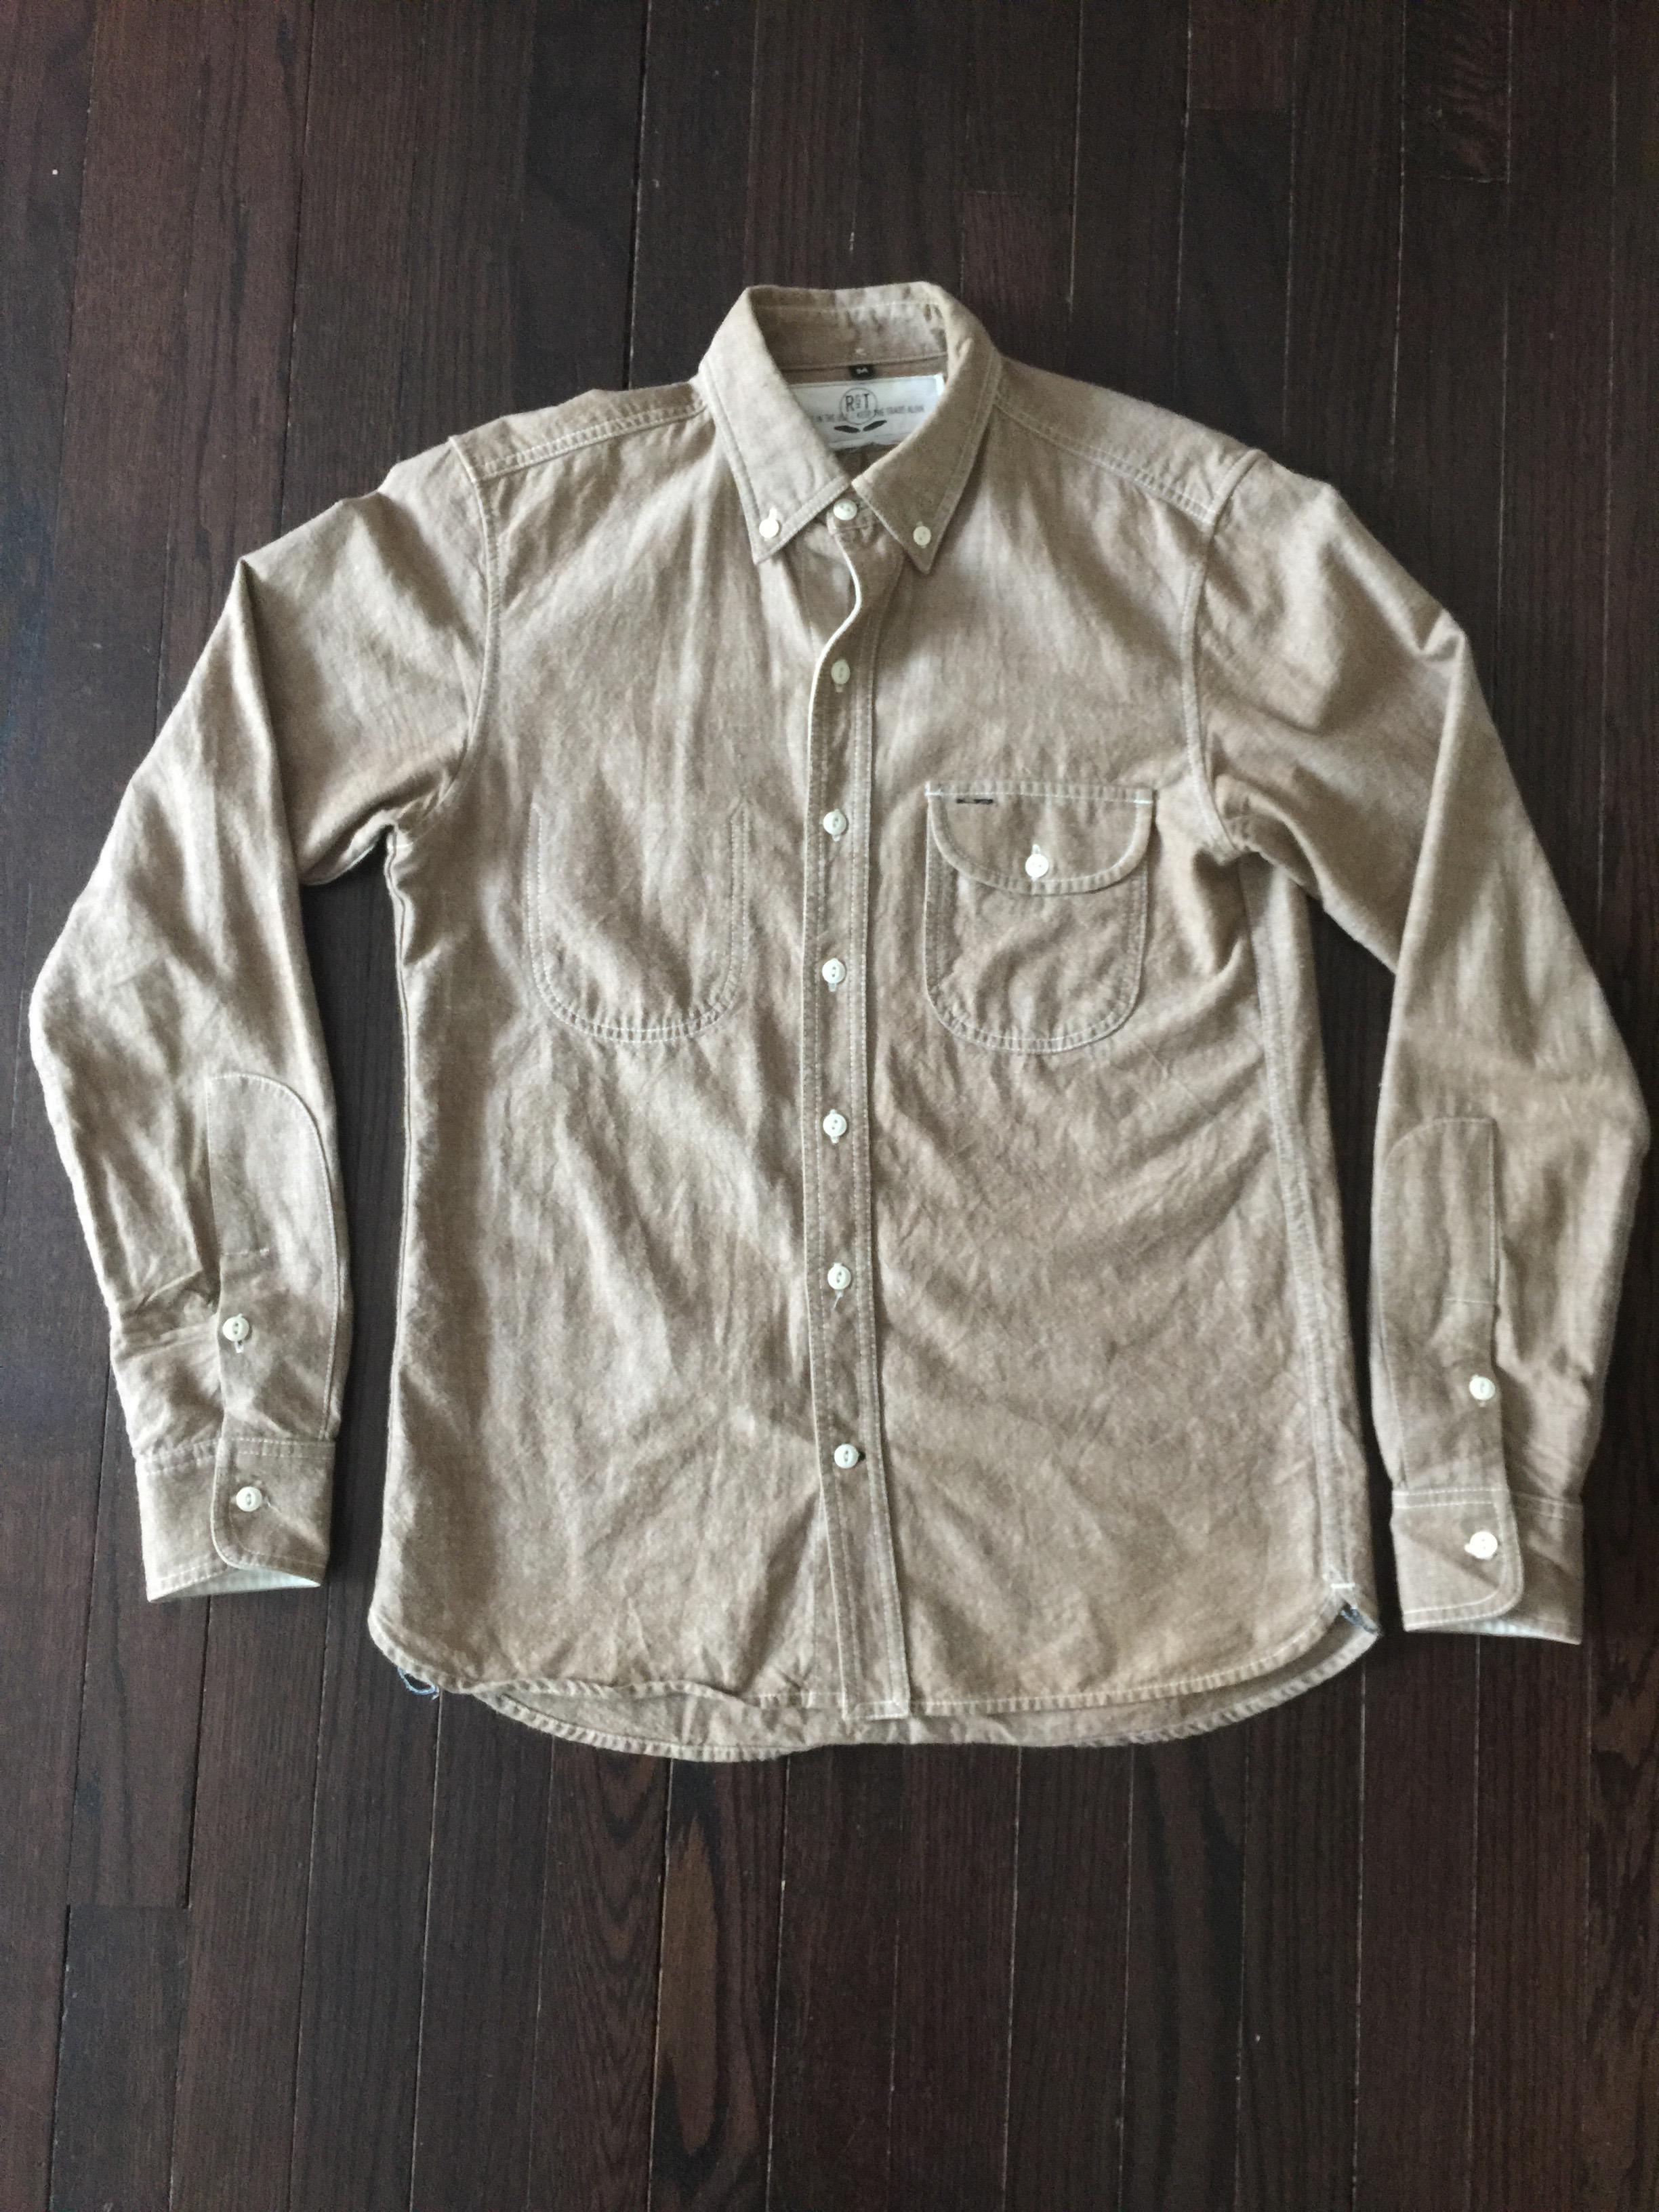 JR Magat's photos in Rogue Territory Light Brown Chambray Jumper Shirt  - Size Medium